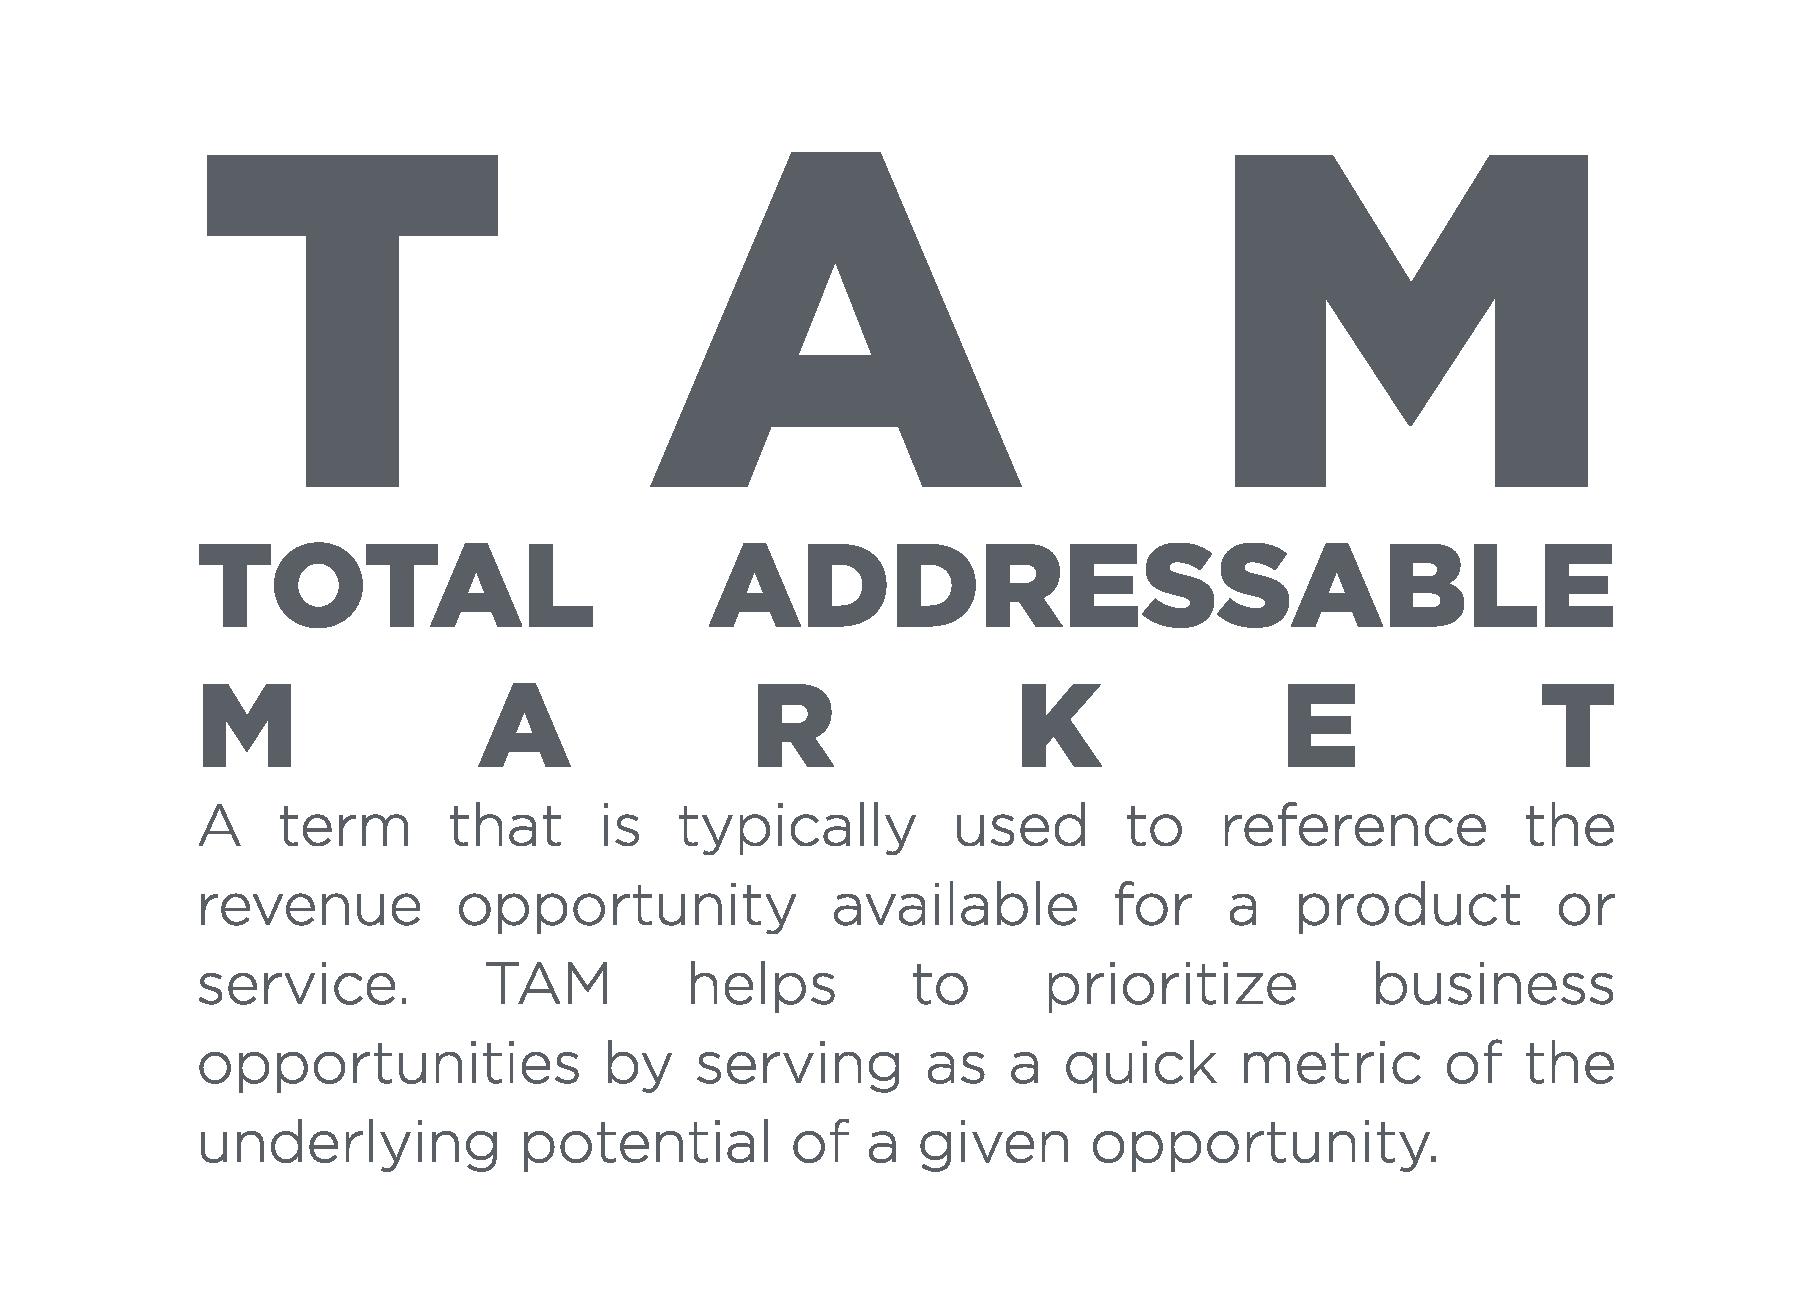 TAM Total Addressable Market